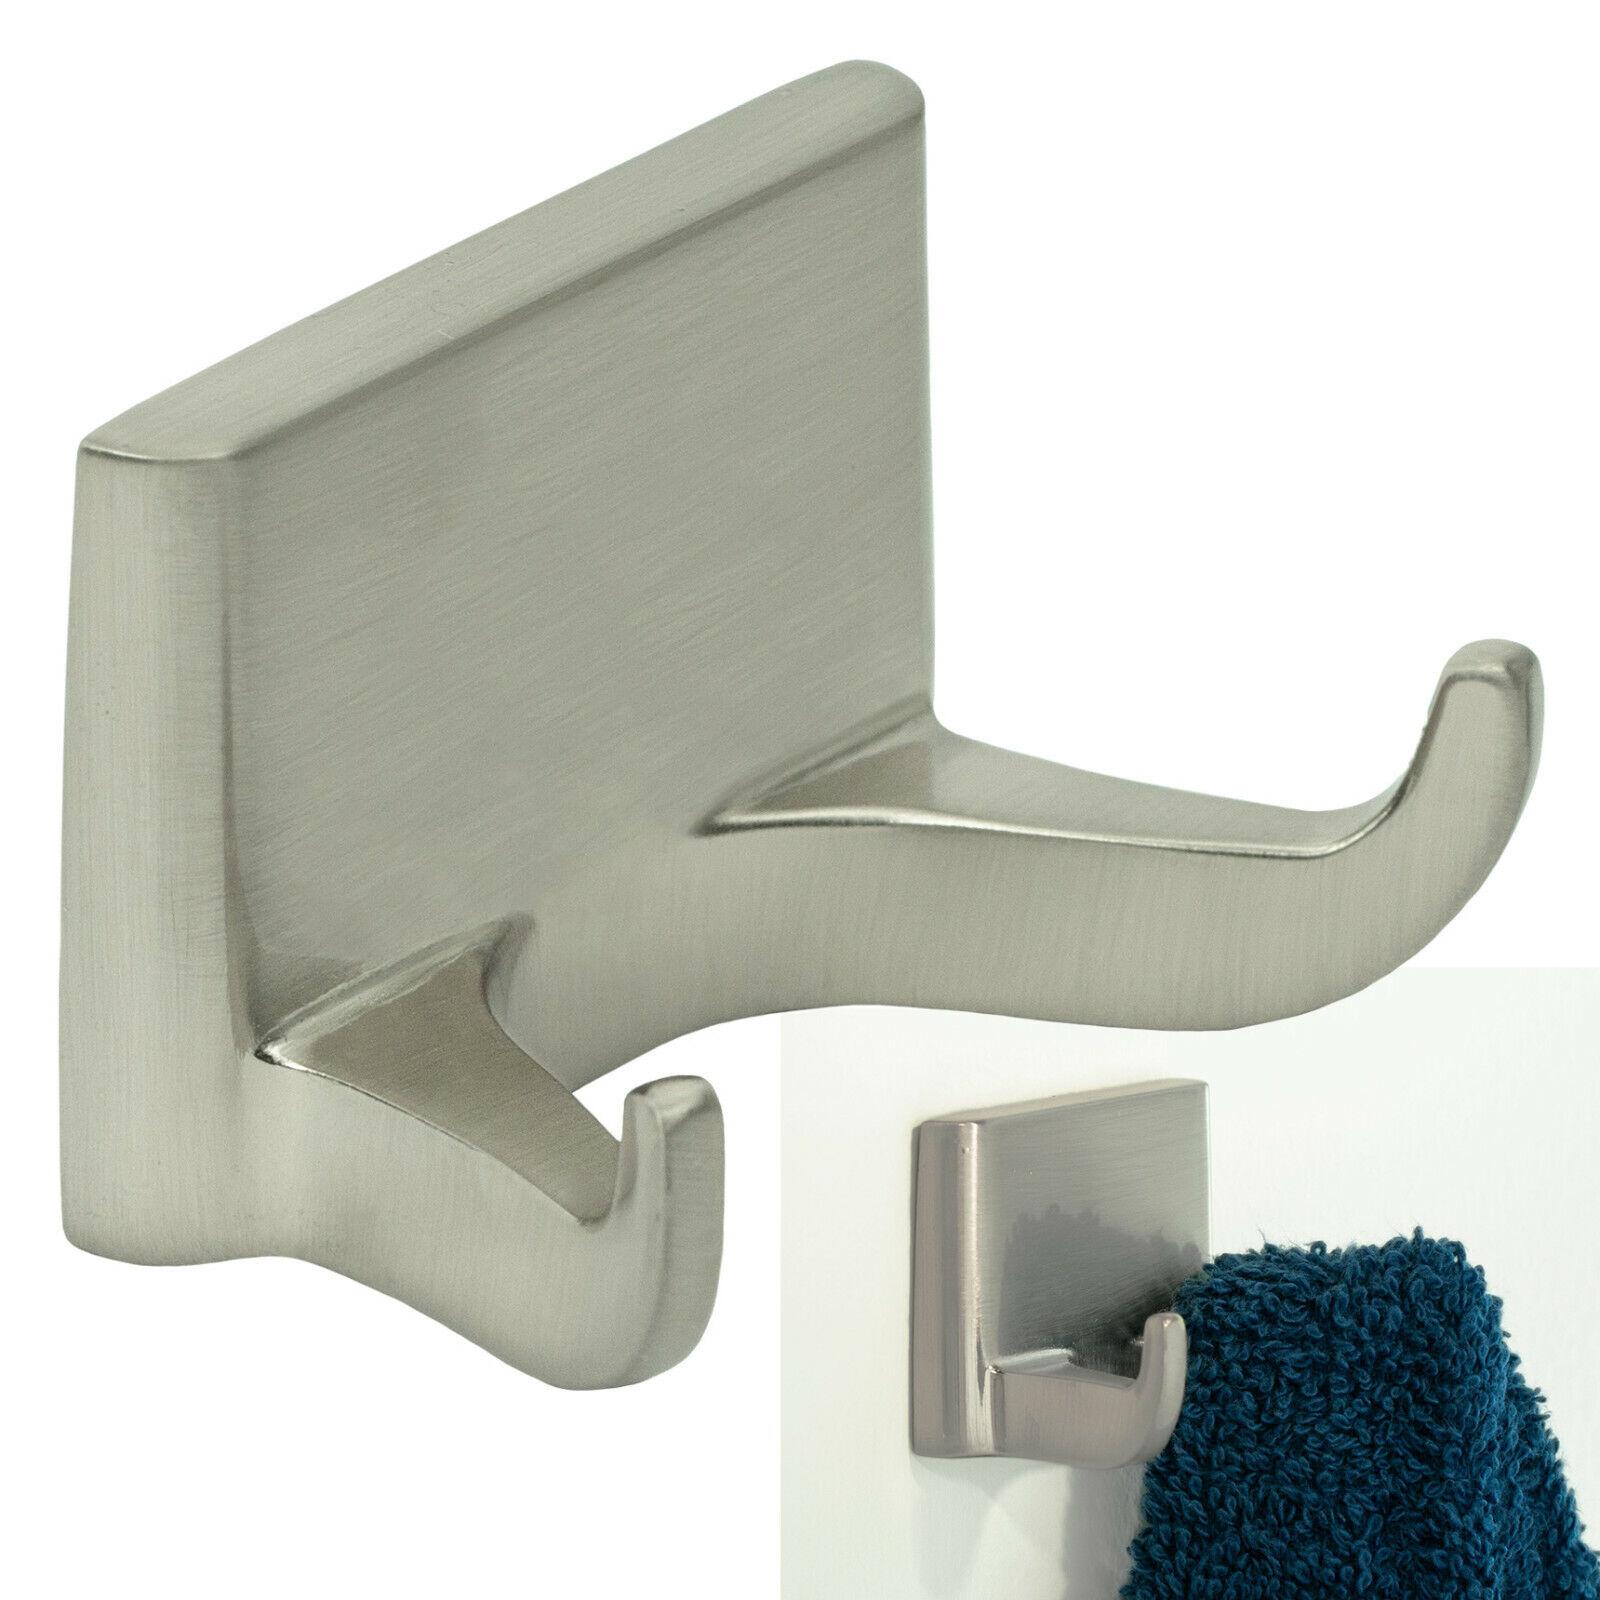 Redwood Series Double Robe Hook Bath Hardware Bathroom Accessory, Brushed Nickel Bath